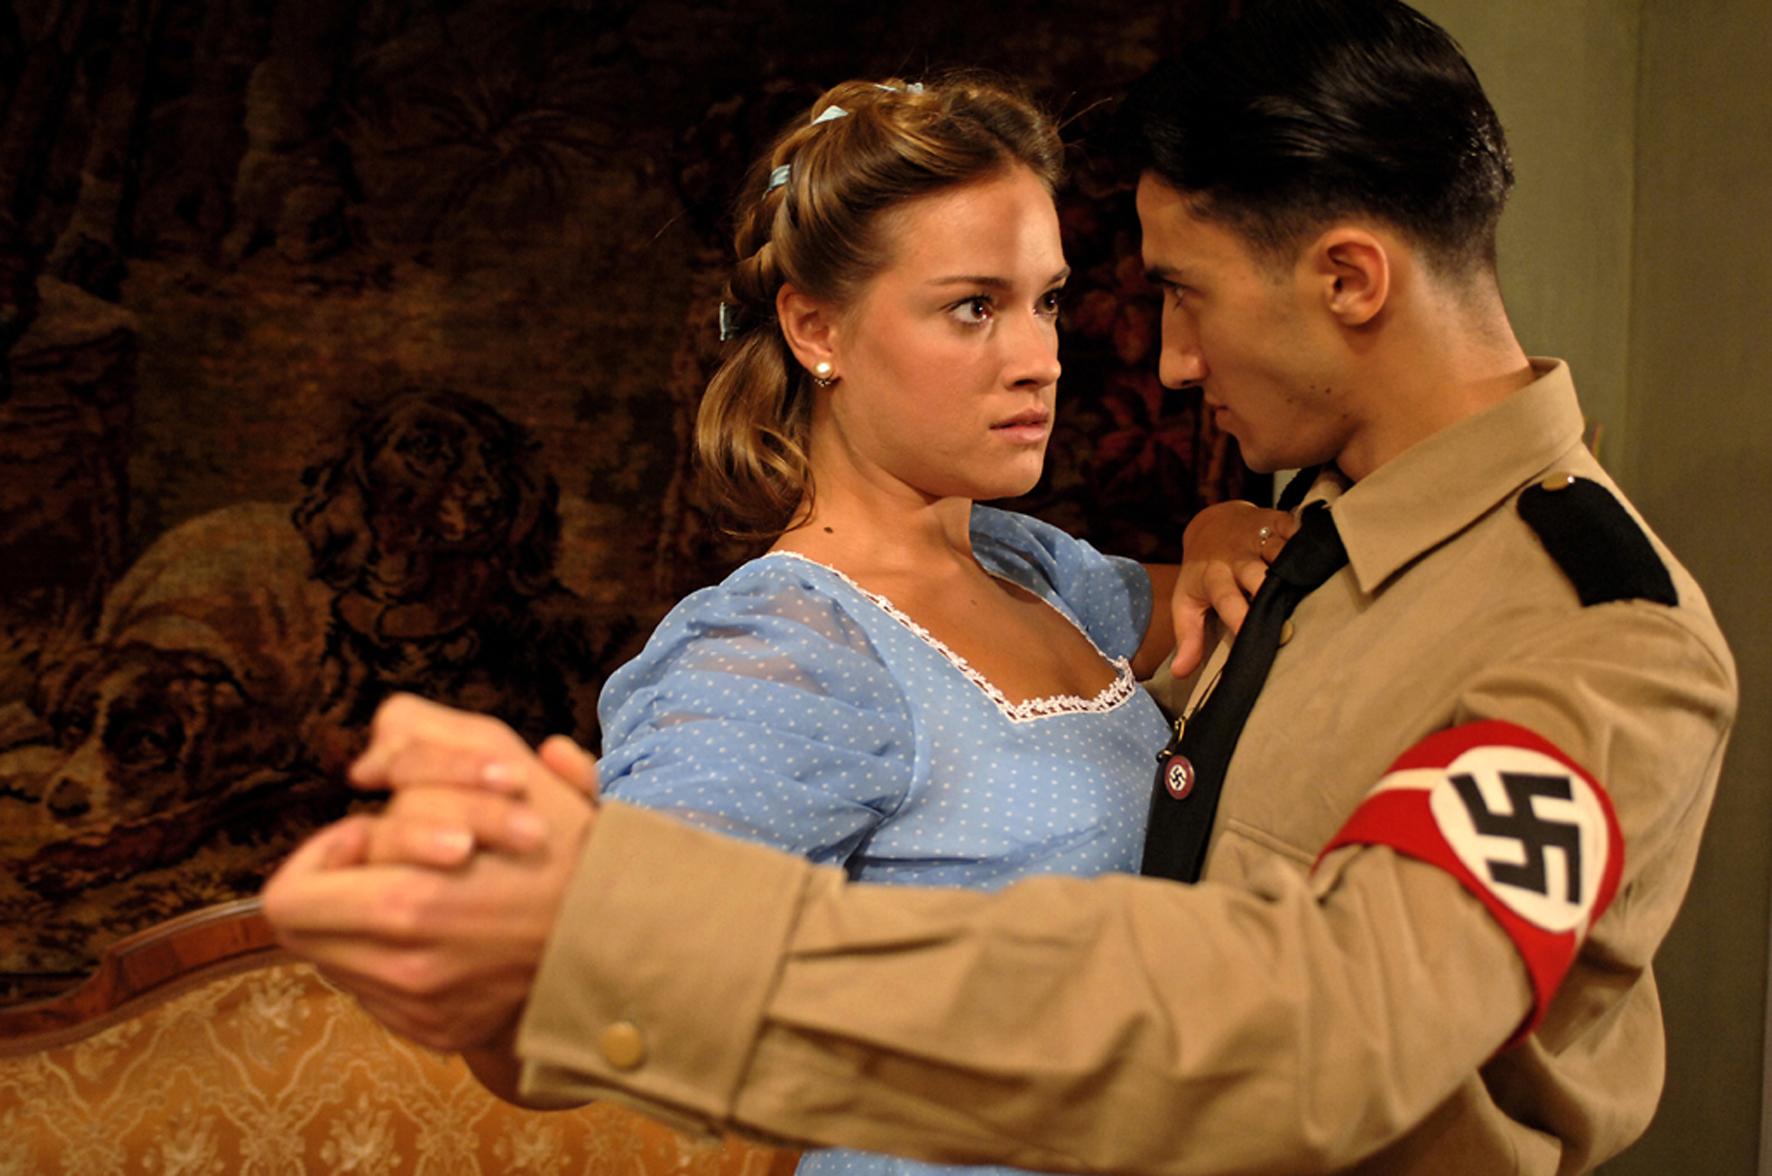 Alicja Bachleda and Axel Moustache in Der geköpfte Hahn (2007)